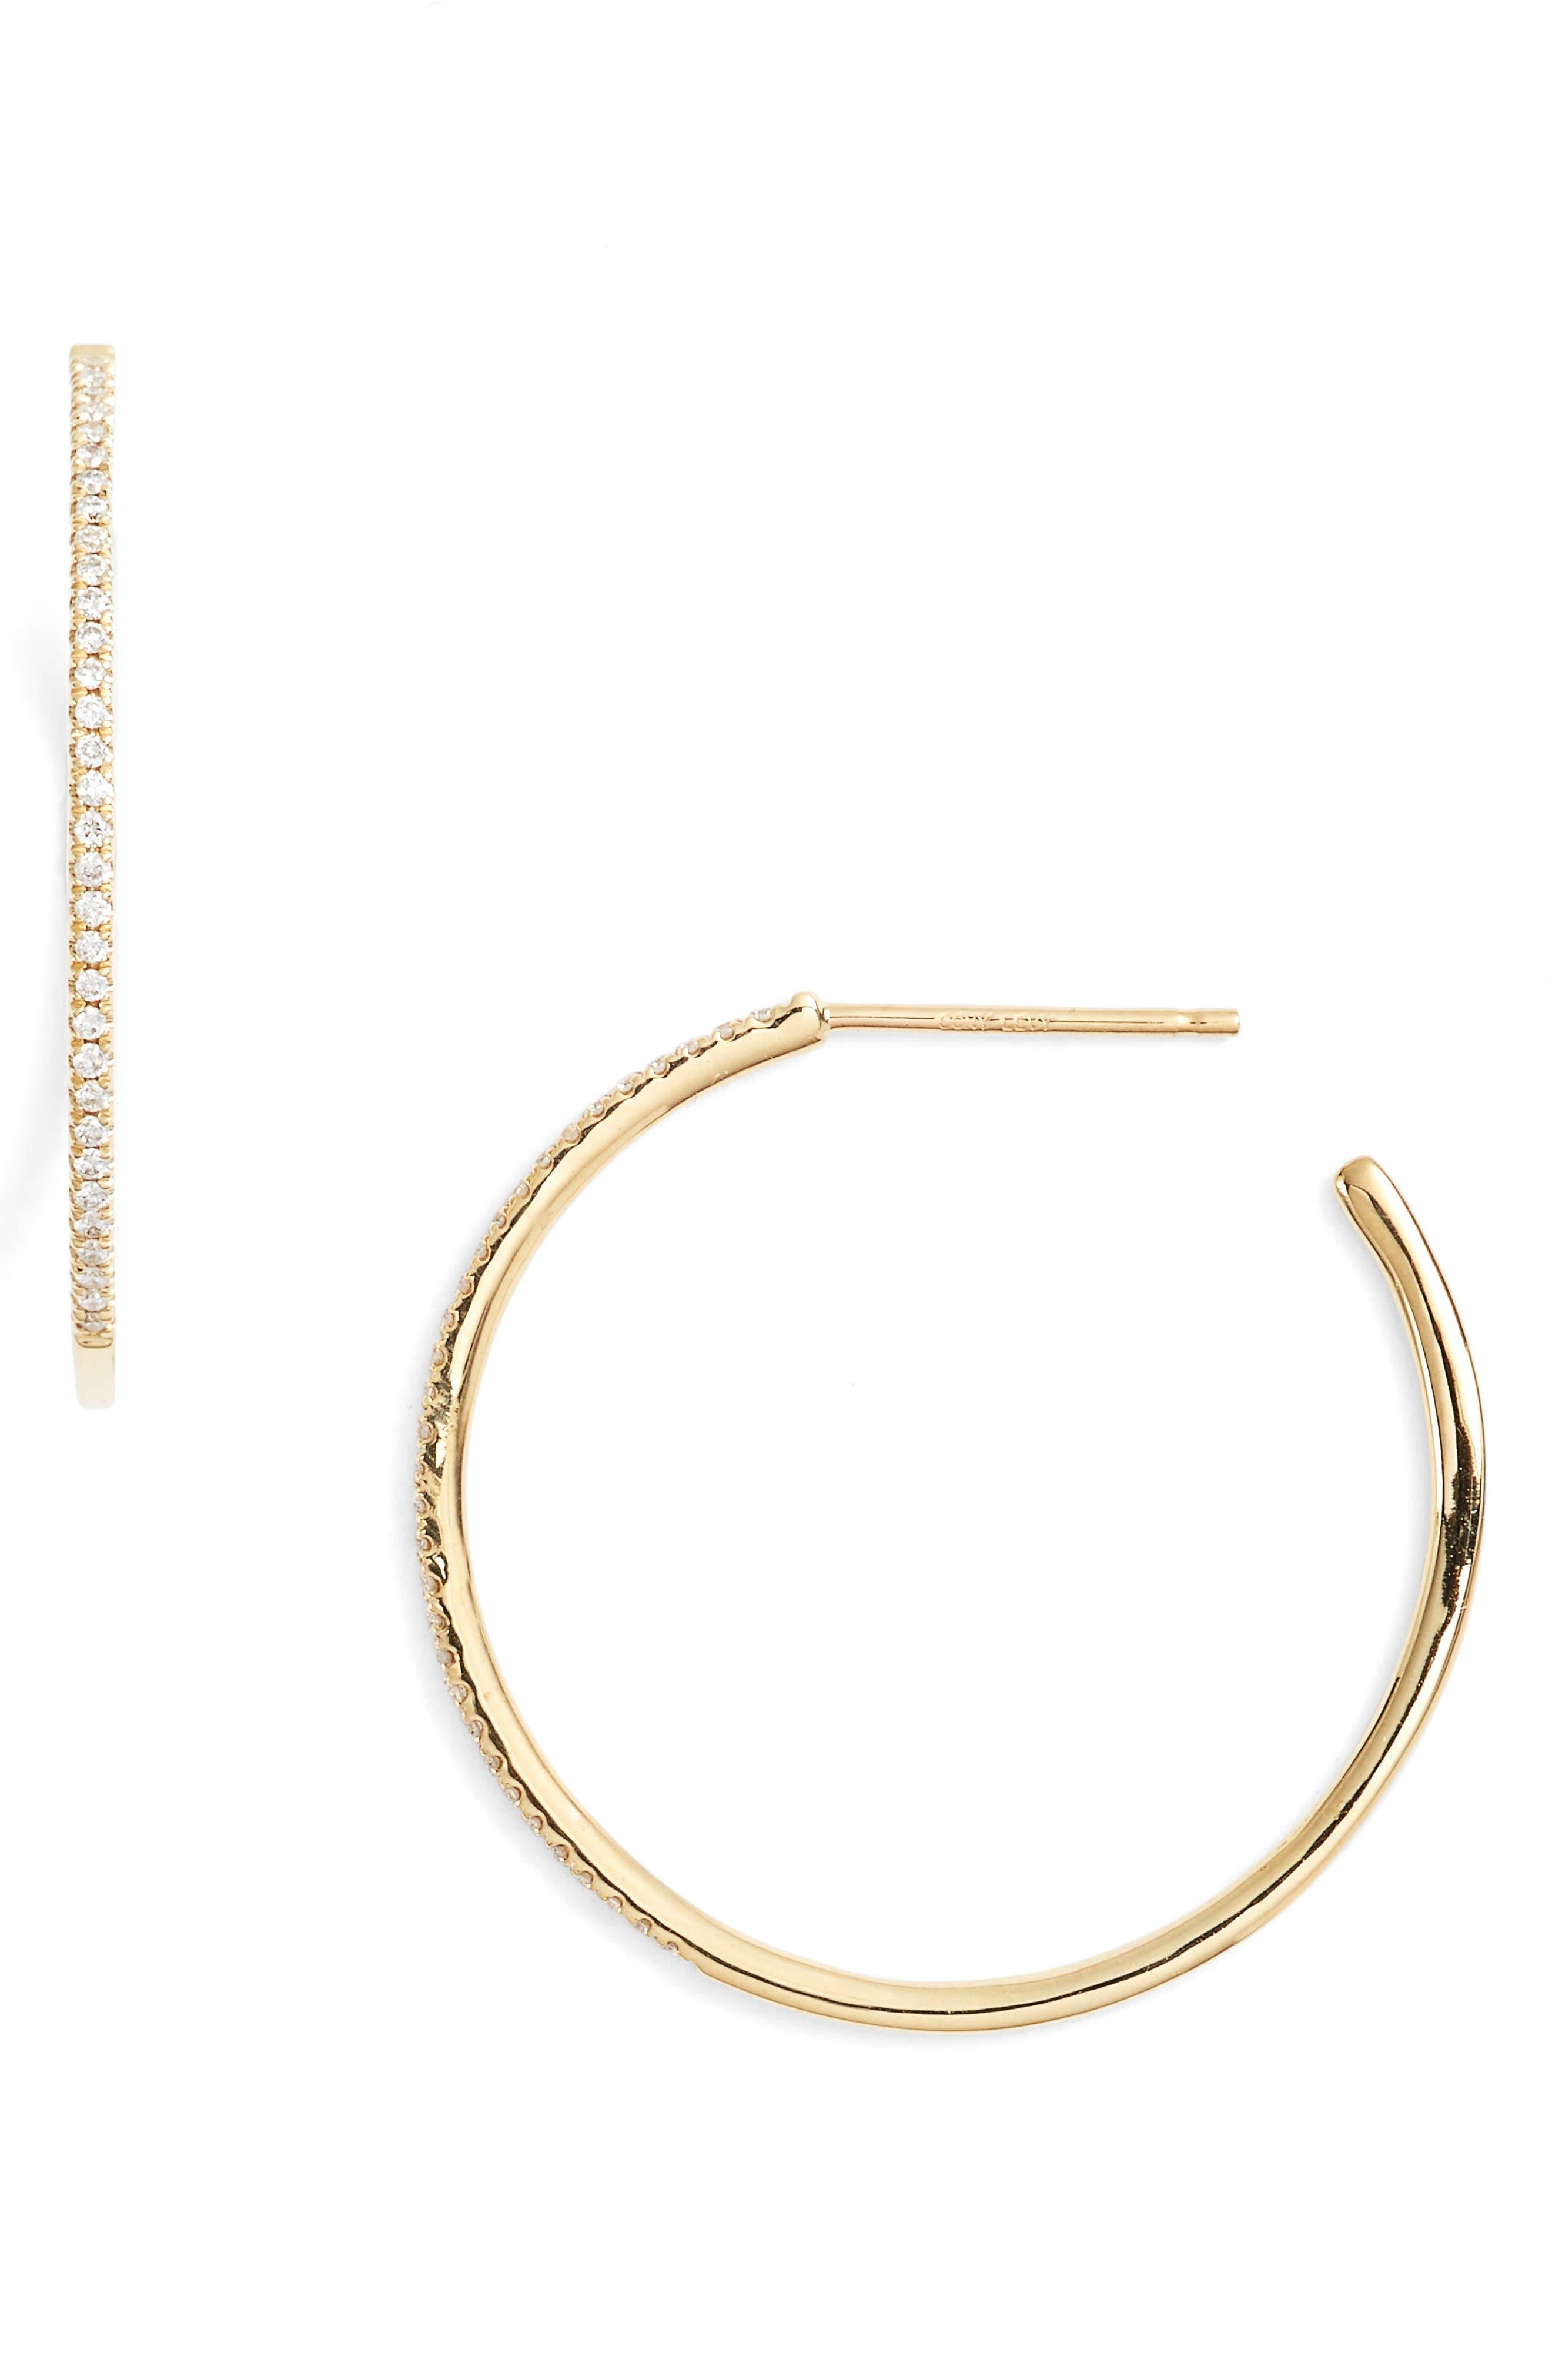 Ella Diamond Hoop Earrings,                             Main thumbnail 1, color,                             YELLOW GOLD